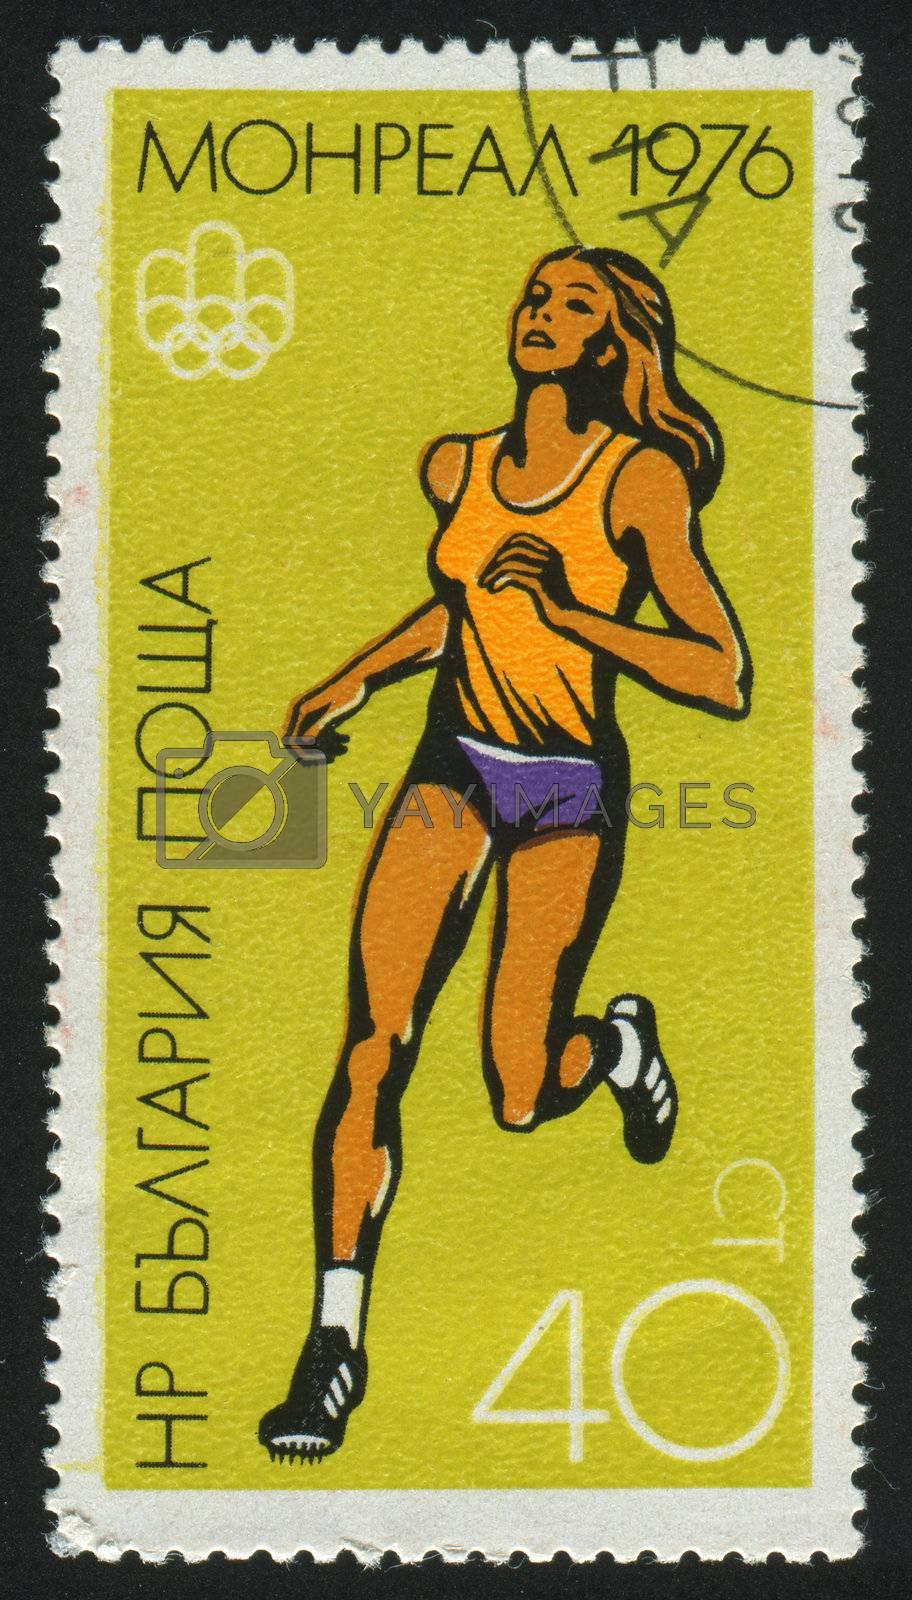 BULGARIA - CIRCA 1976: stamp printed by Bulgaria, shows woman runner, circa 1976.